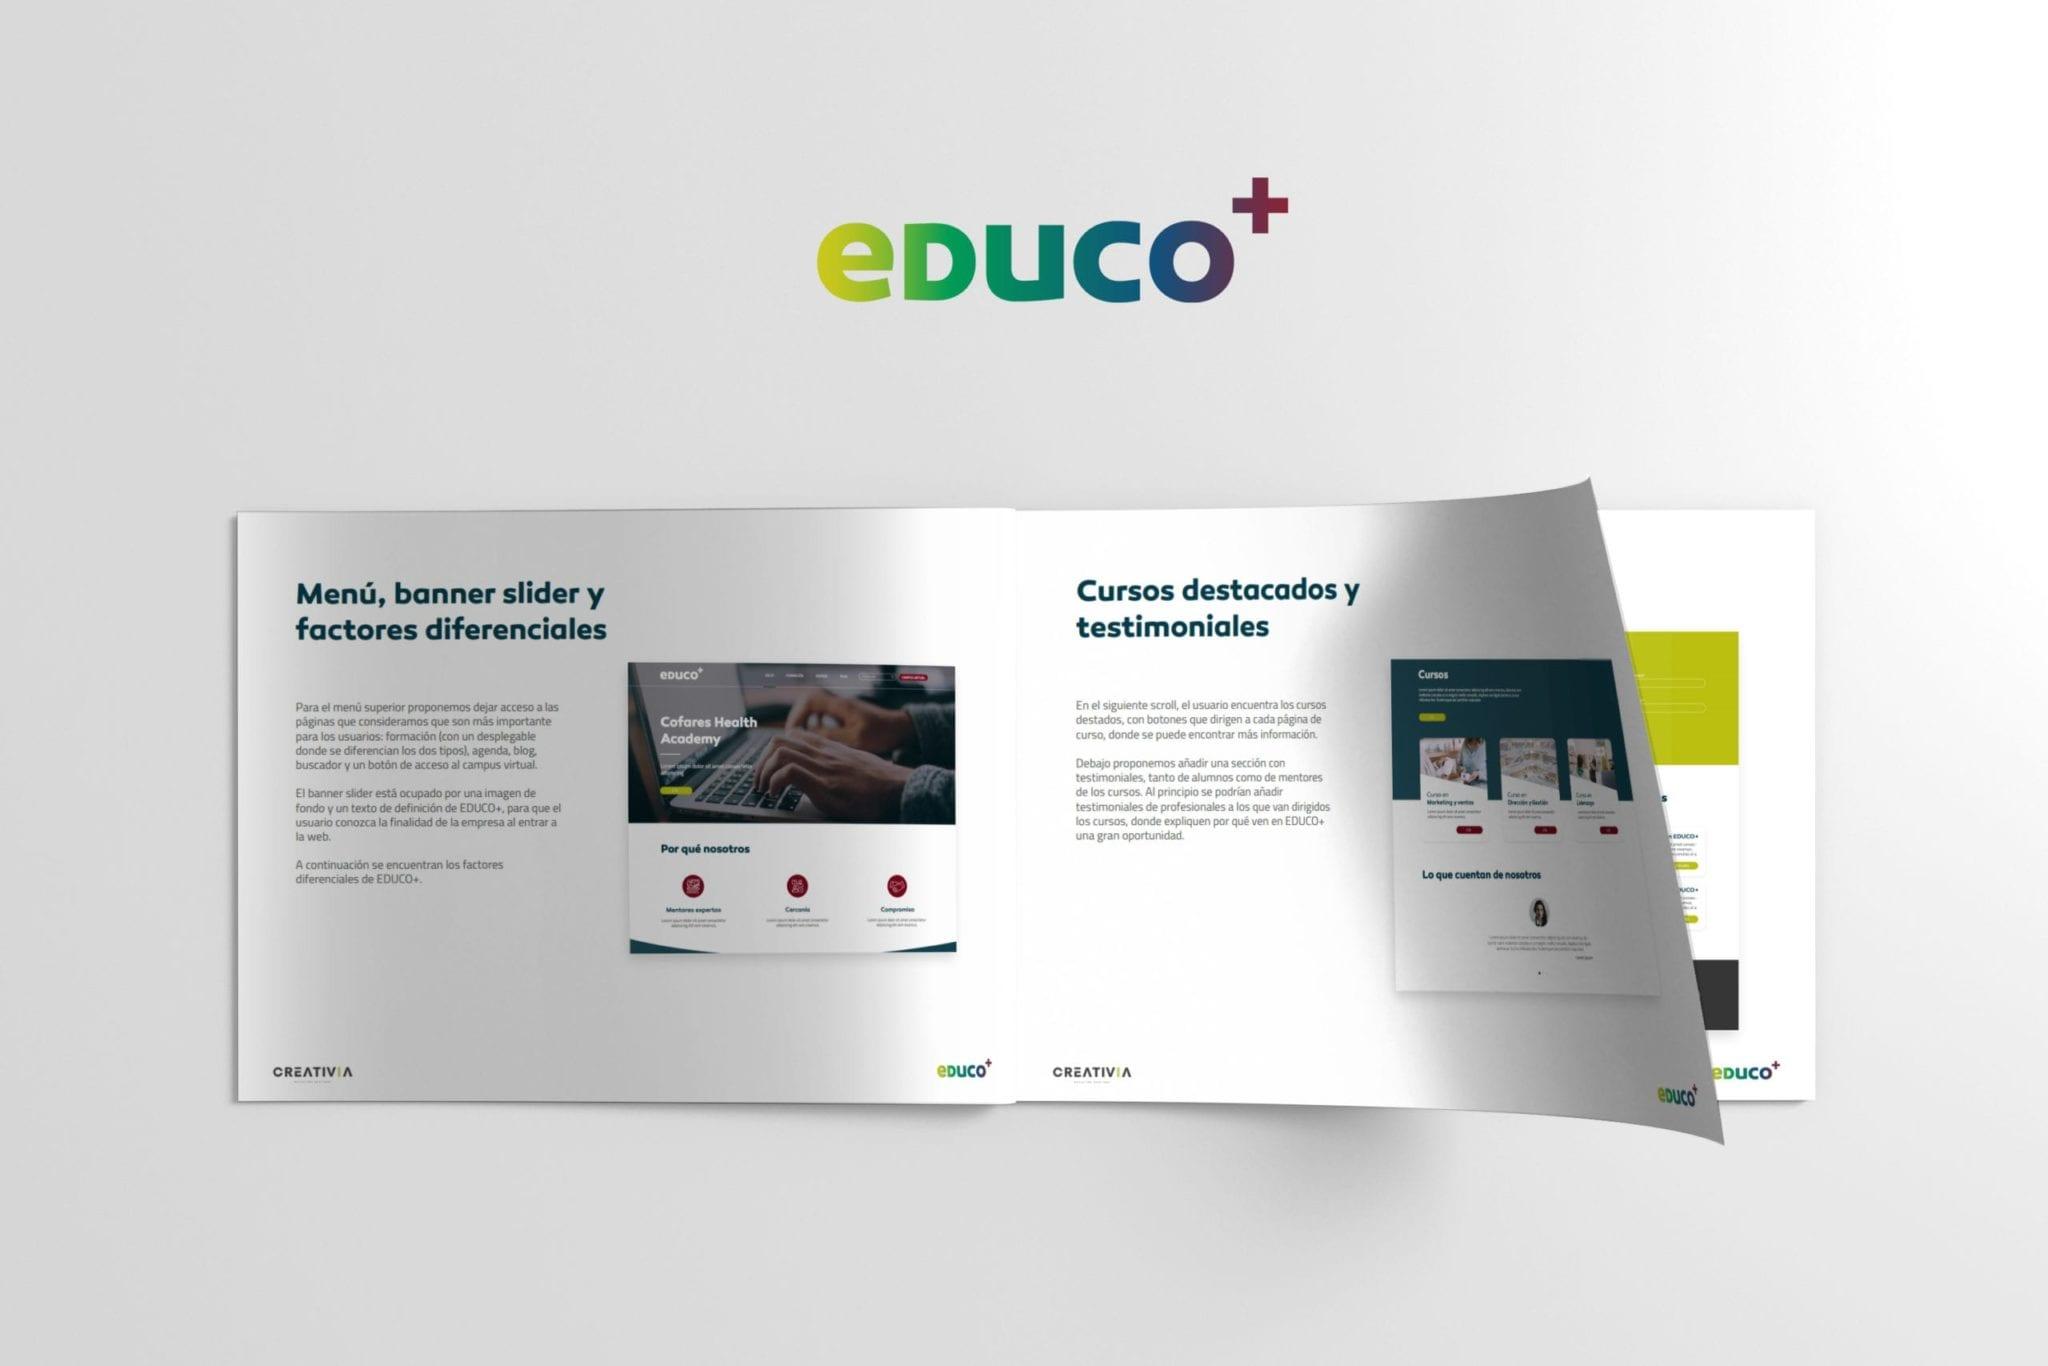 Dossier eDUCO+